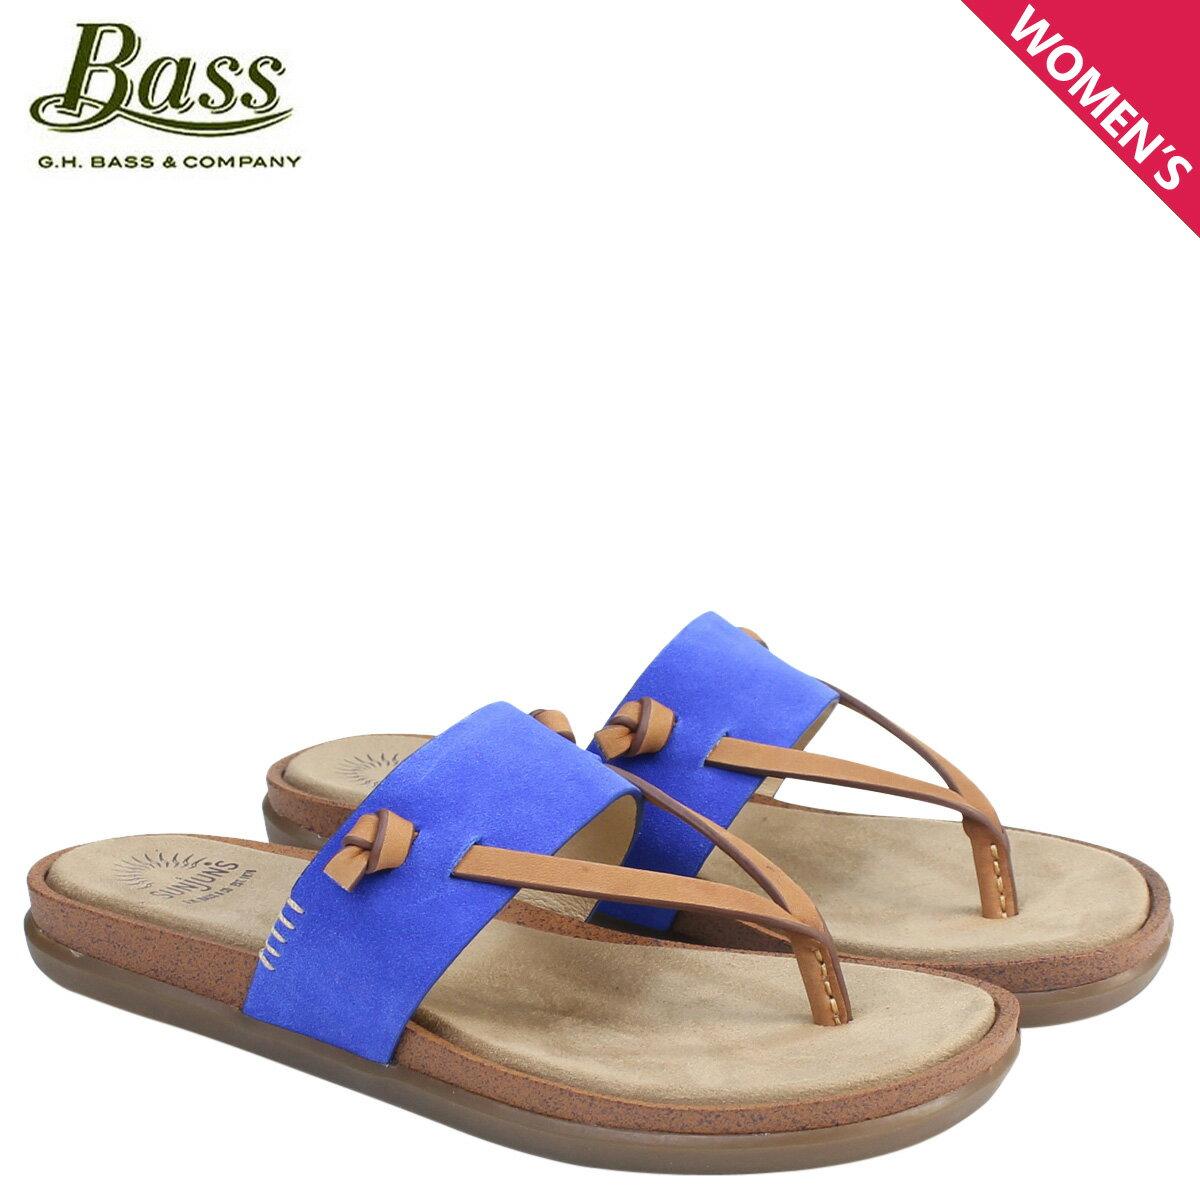 G.H. BASS サンダル レディース ジーエイチバス トングサンダル SHANNON THONG SUNJUNS 71-23016 靴 ブルー